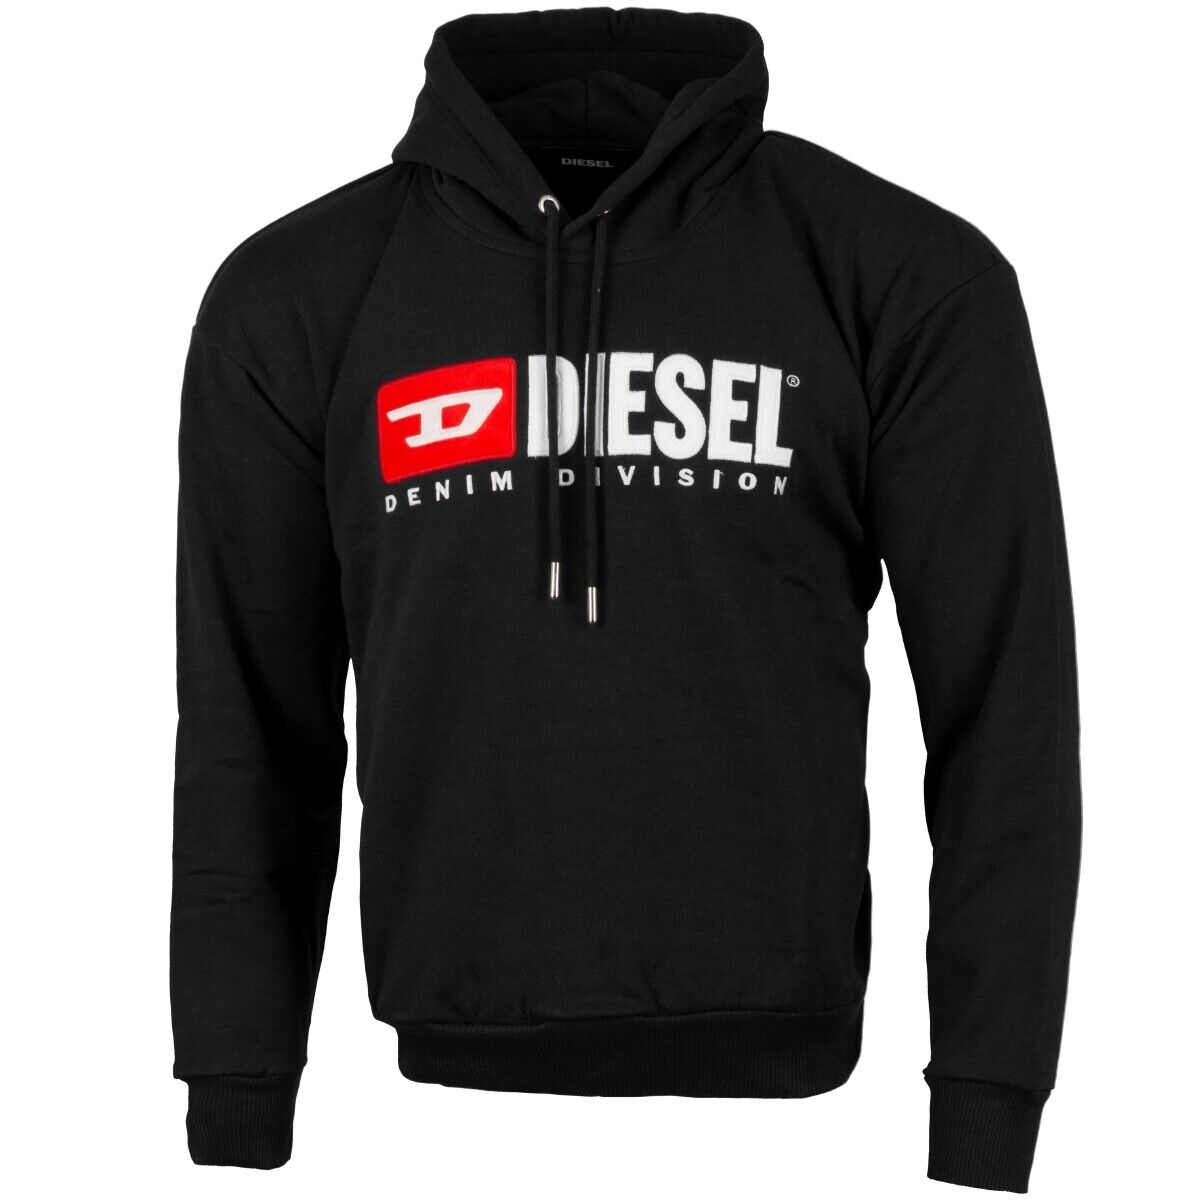 Diesel S-DIVISION S-DIVISION S-DIVISION Sweatshirt Men Herren Pullover Sweater schwarz 00SH34-0CATK-900 a45767